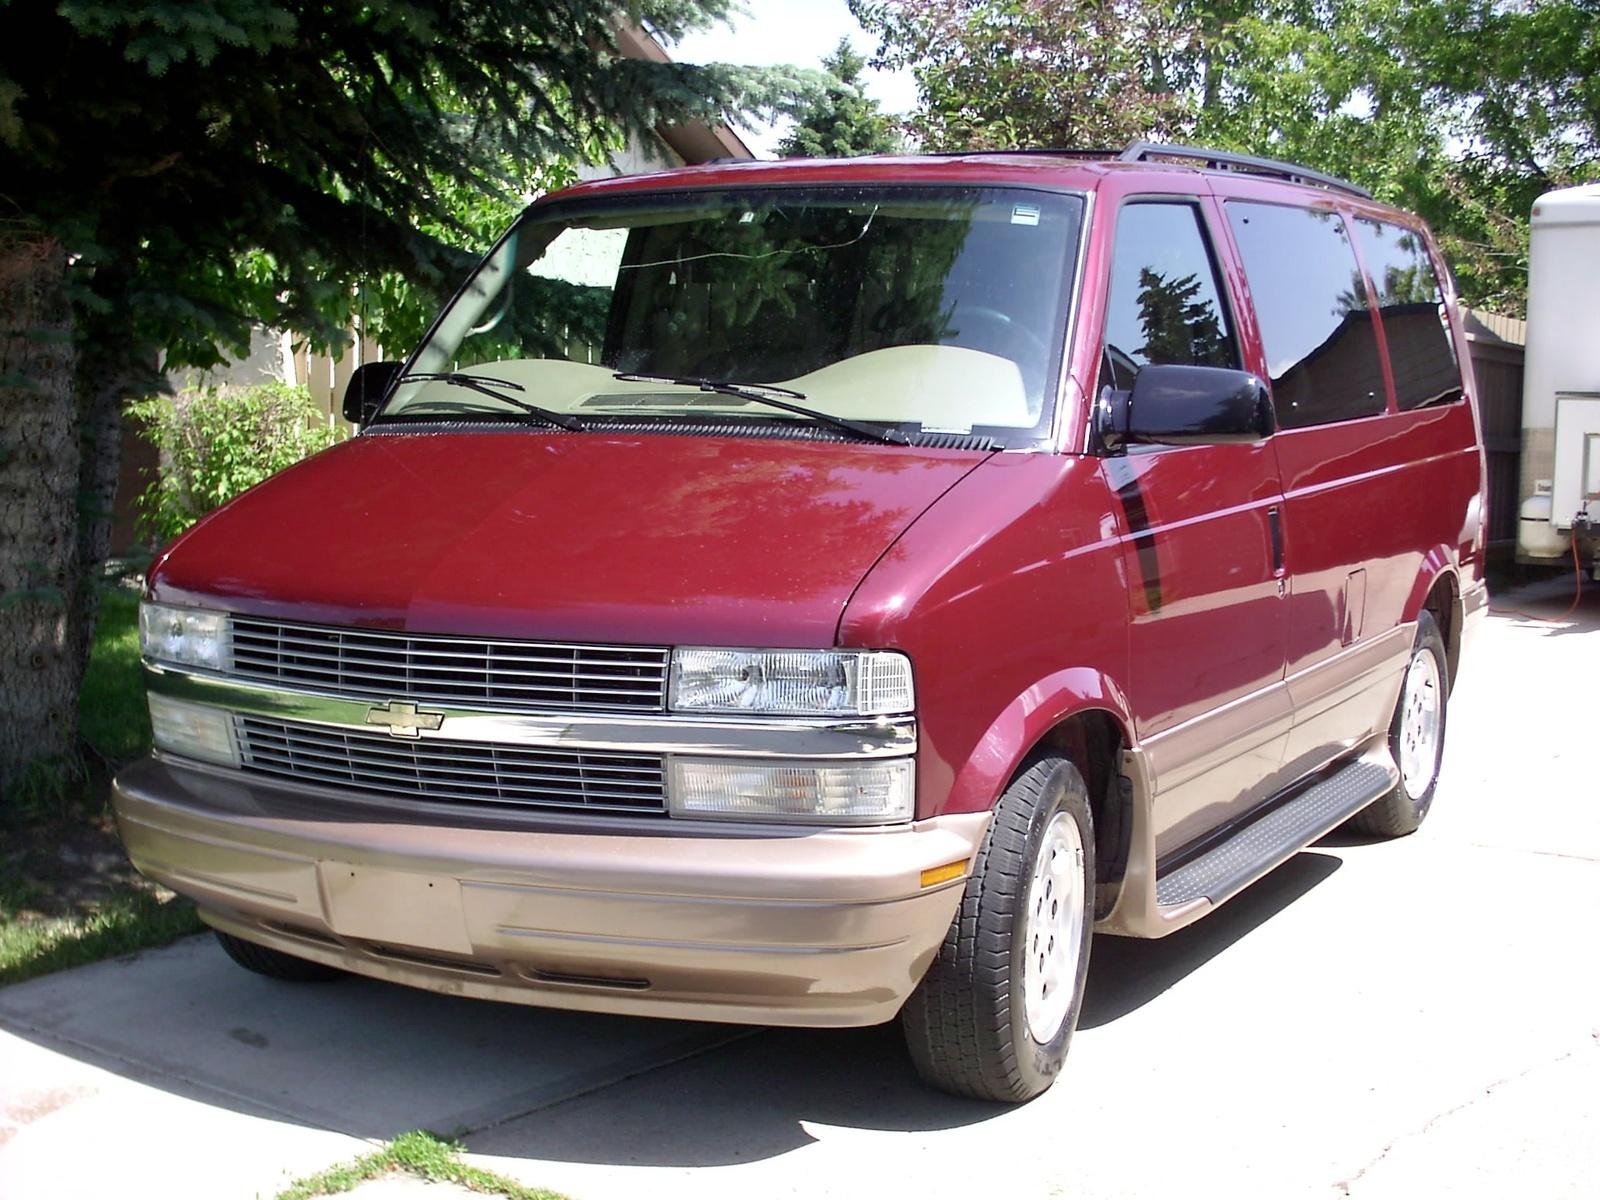 2004 Chevrolet Astro - Overview - CarGurus